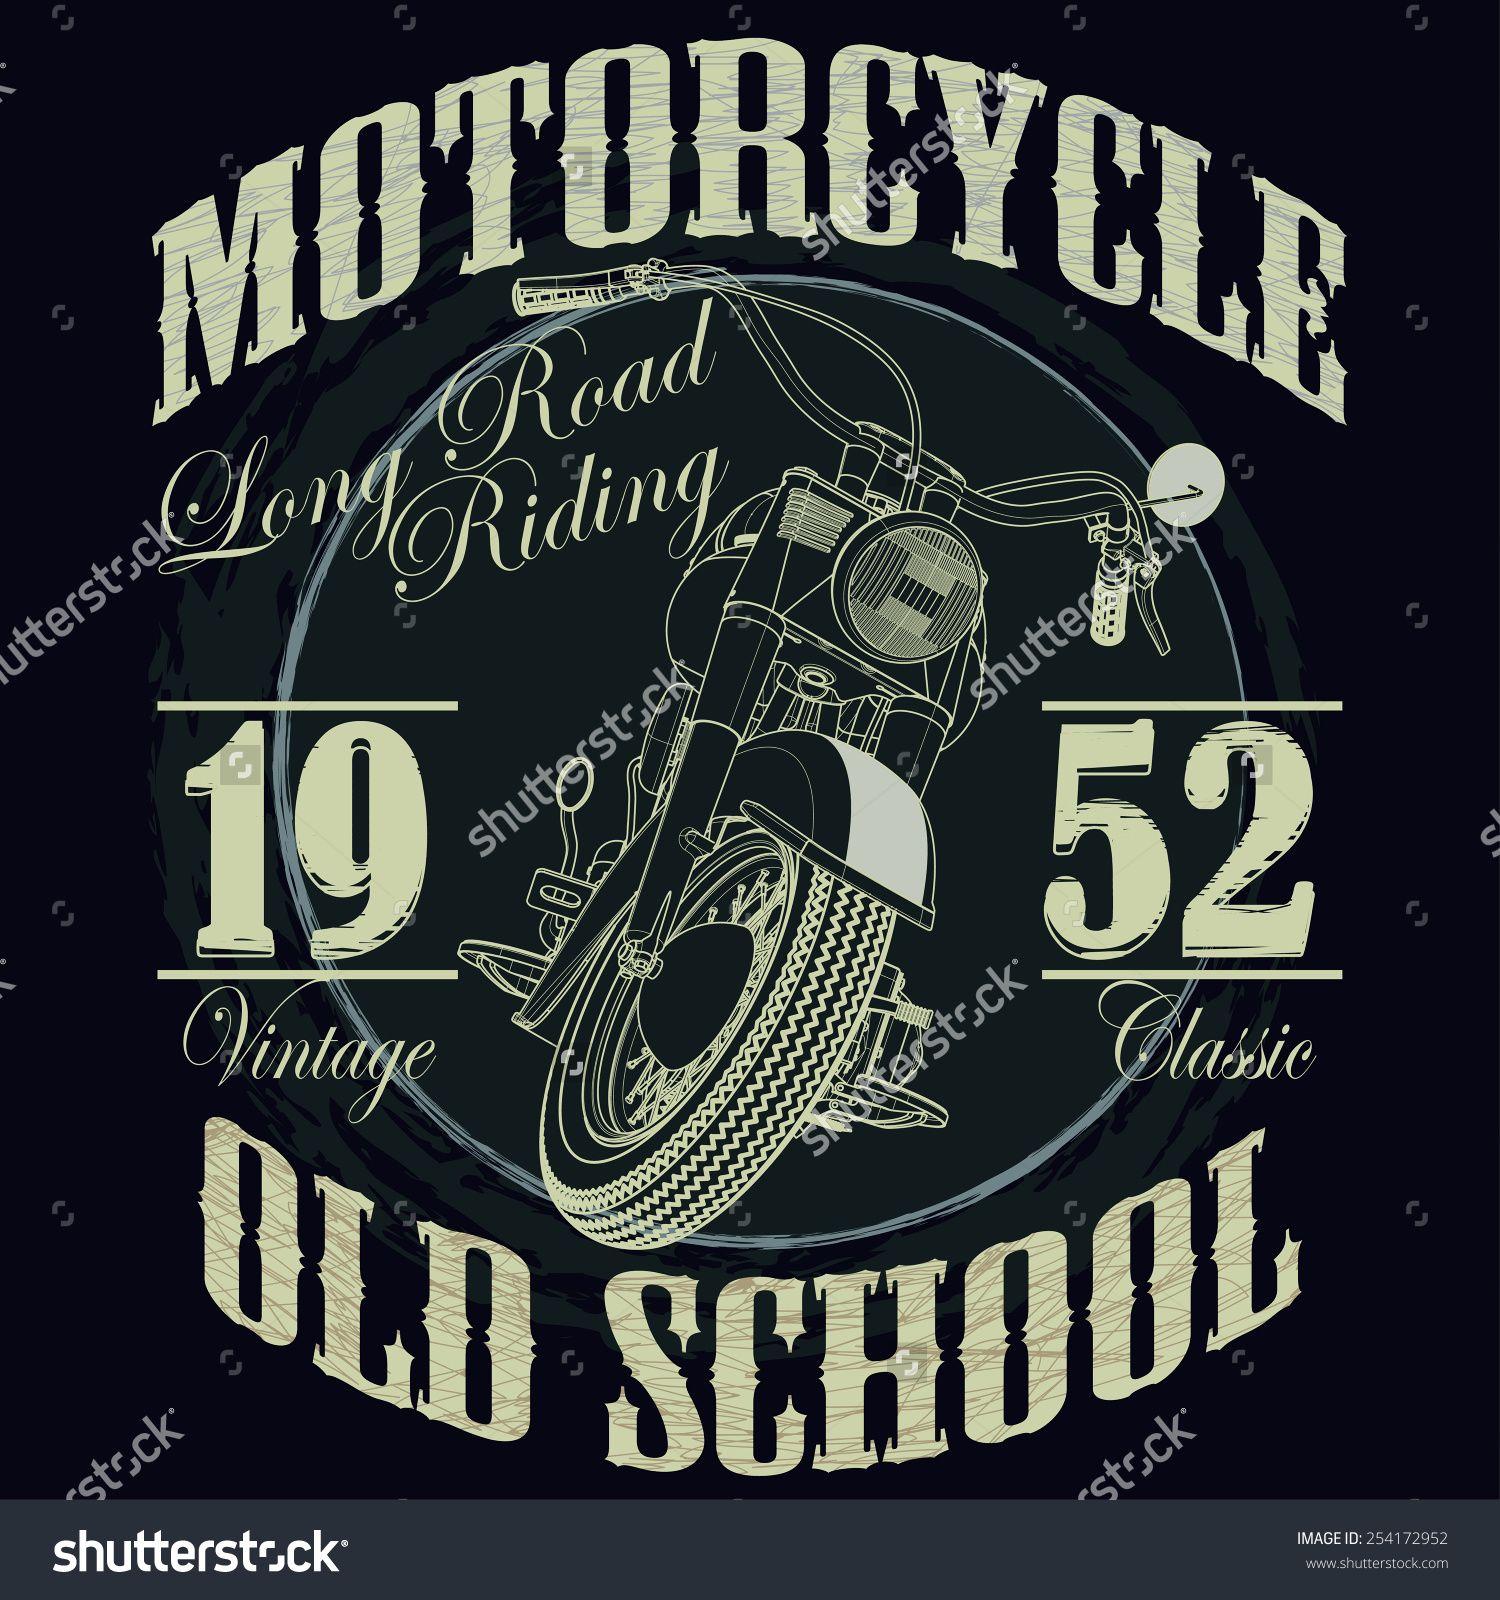 Motorcycle Racing Typography Graphics Old School Bike T